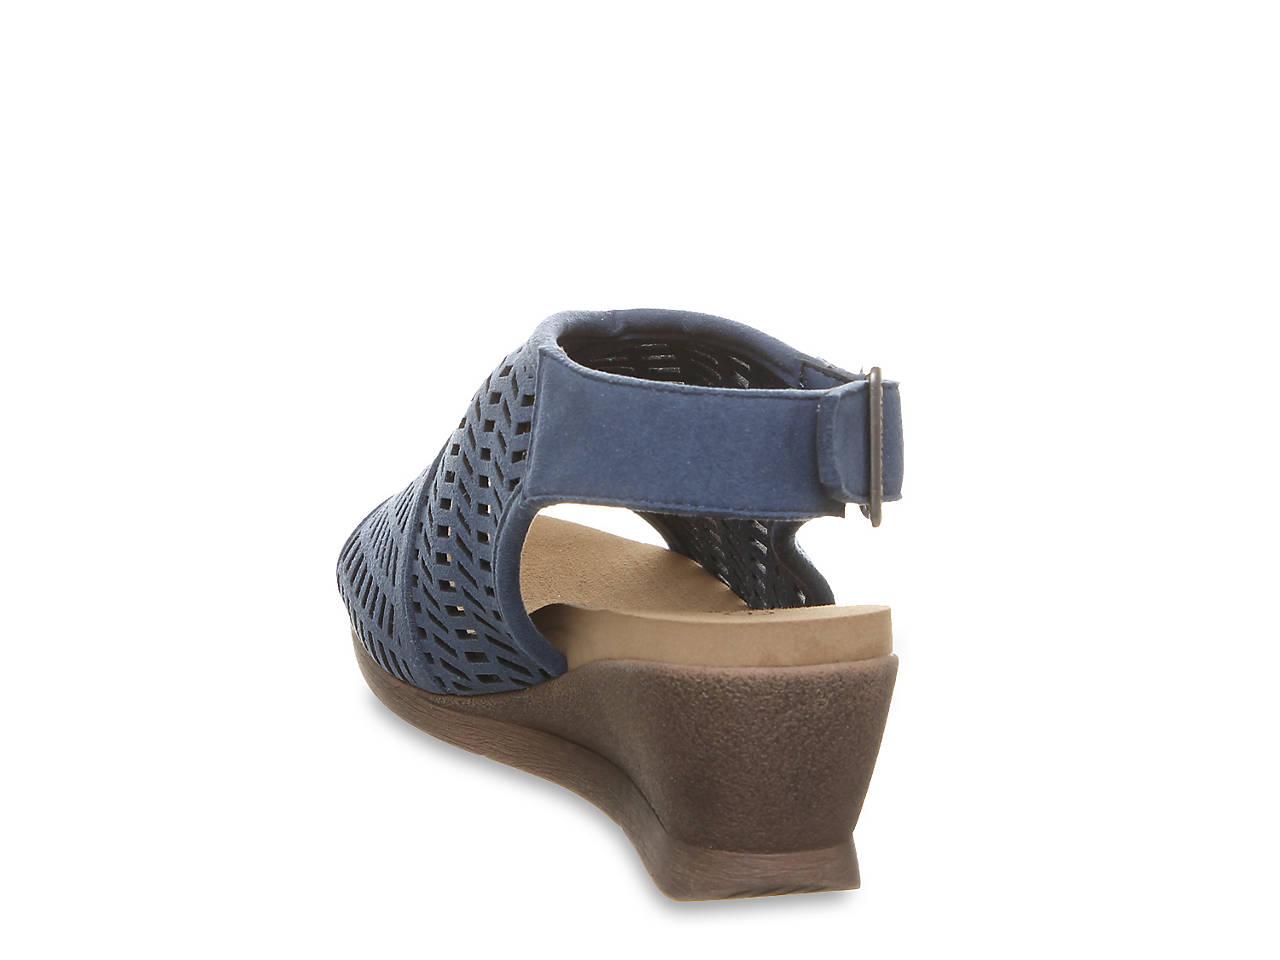 26f749dd7a Home · Women's Shoes · Sandals; Roxie Wedge Sandal. previous